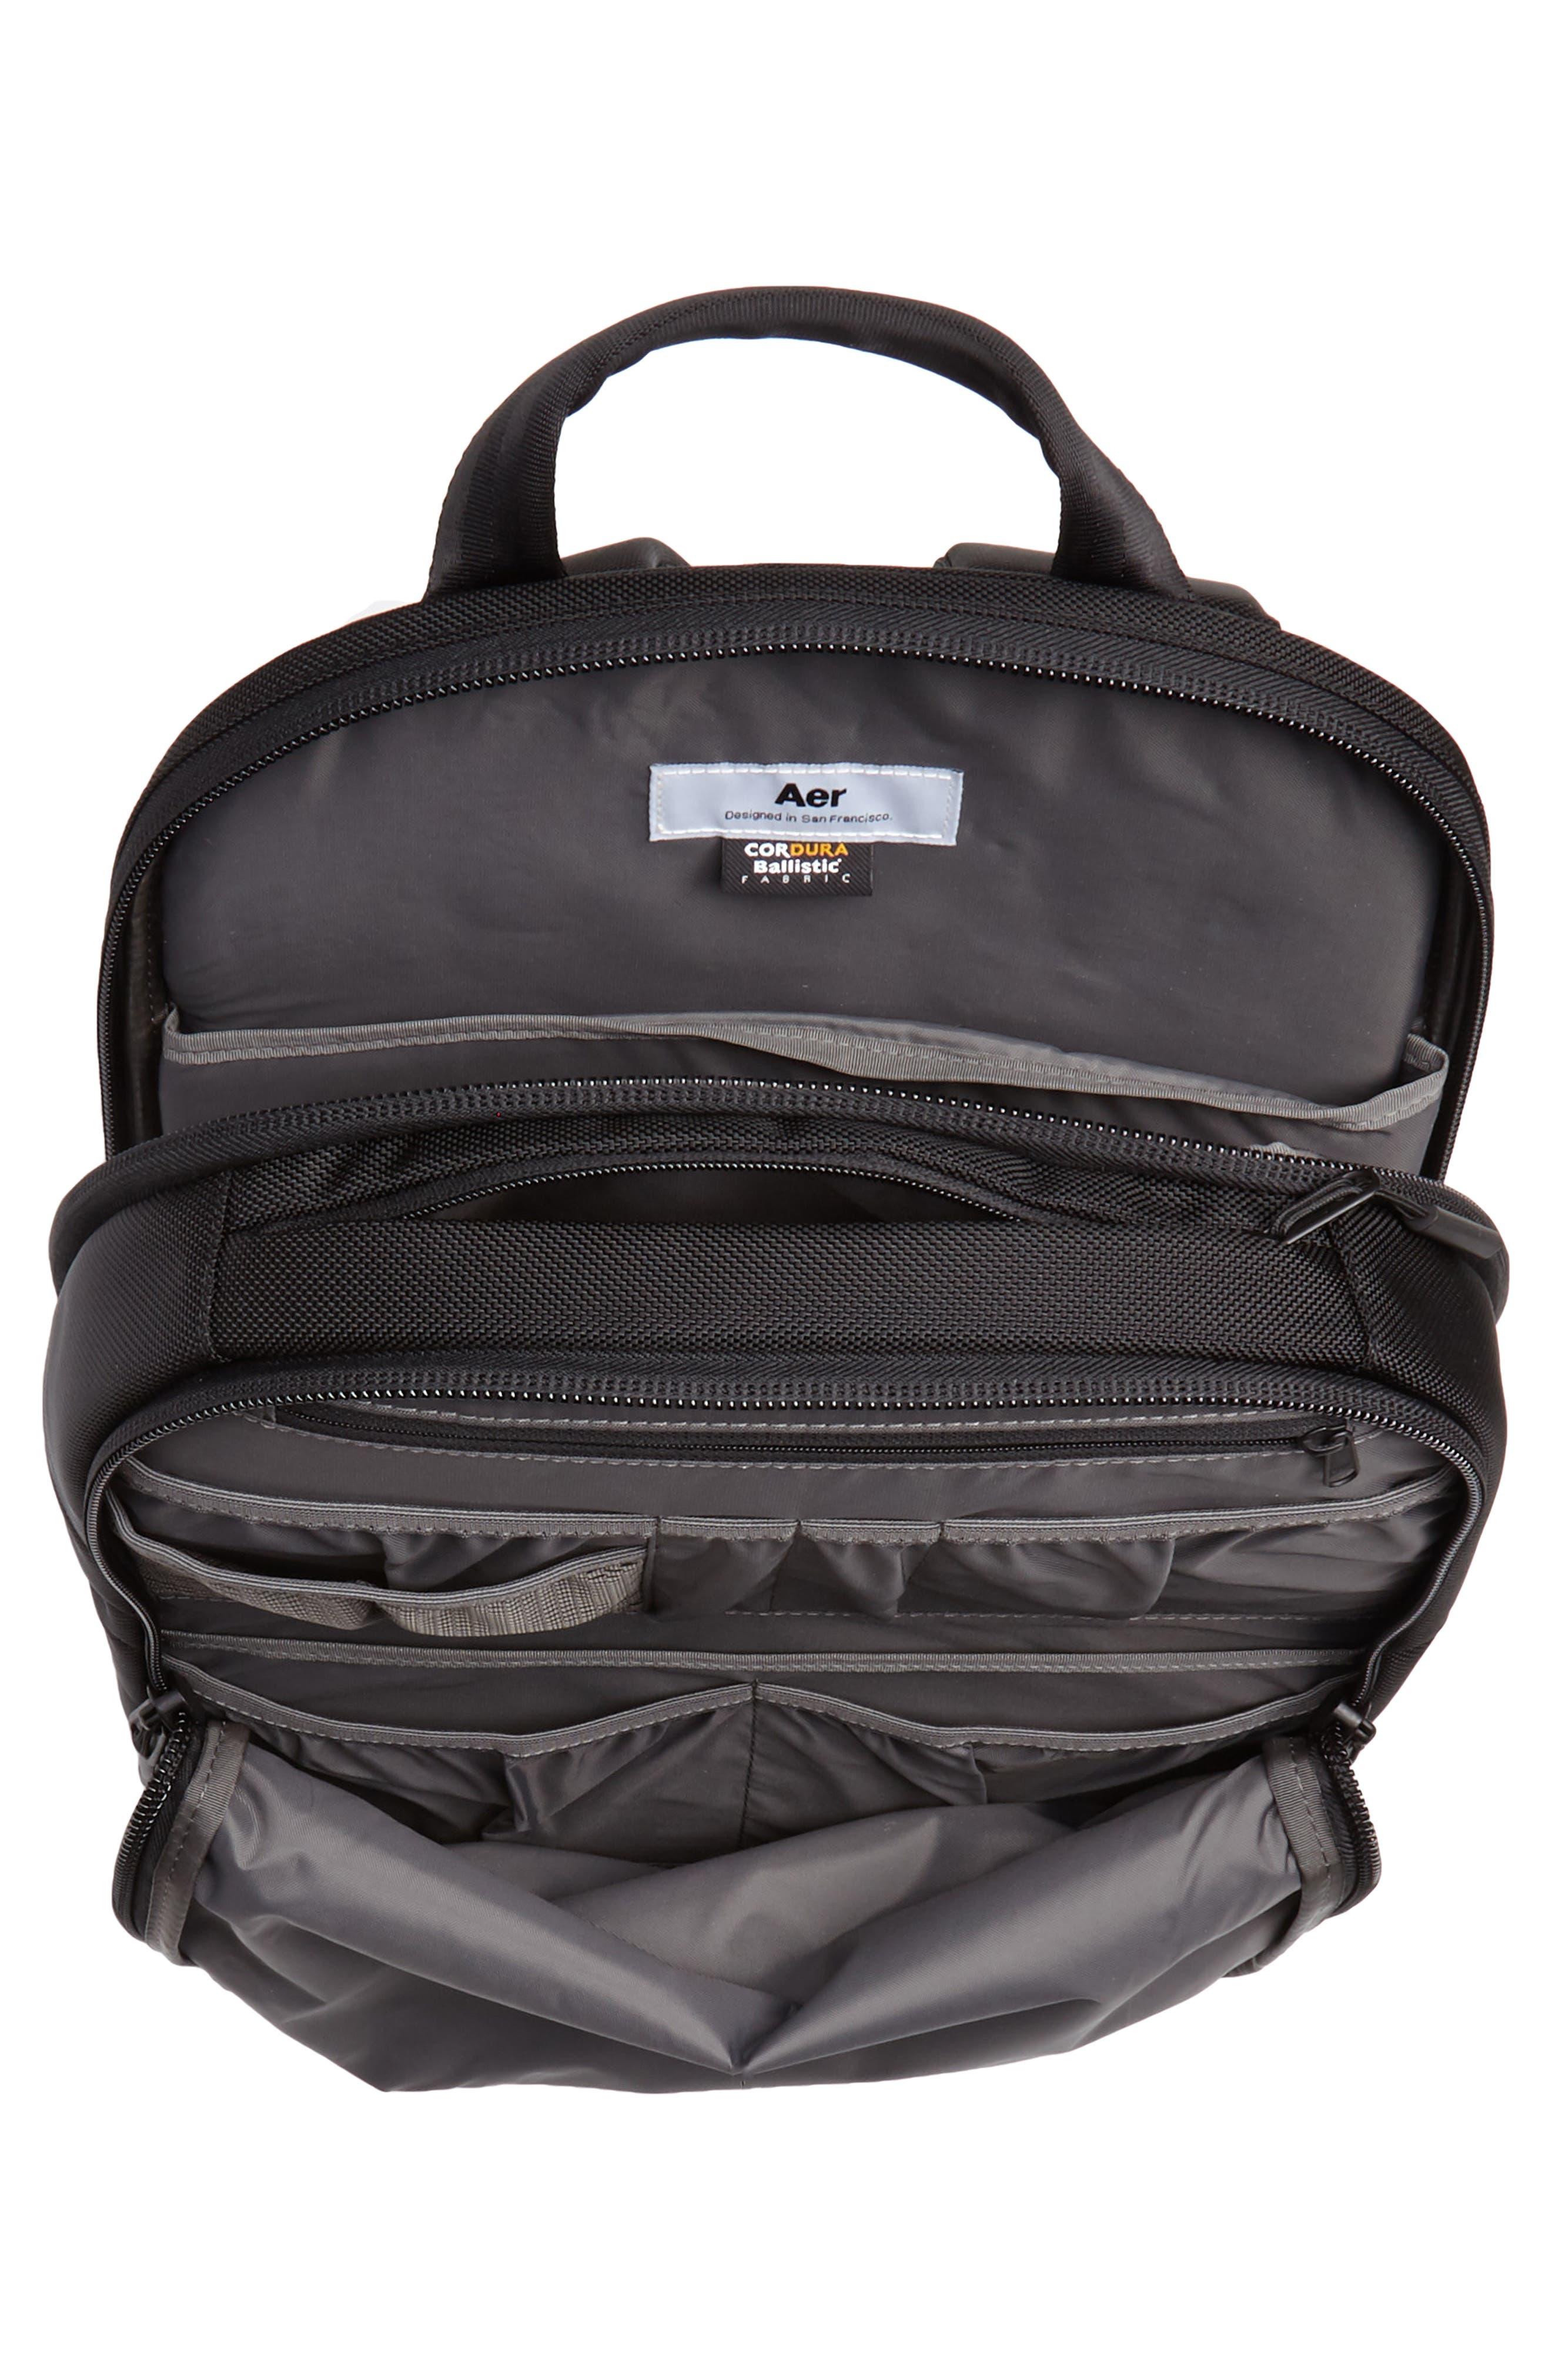 Work Day Backpack,                             Alternate thumbnail 4, color,                             Black